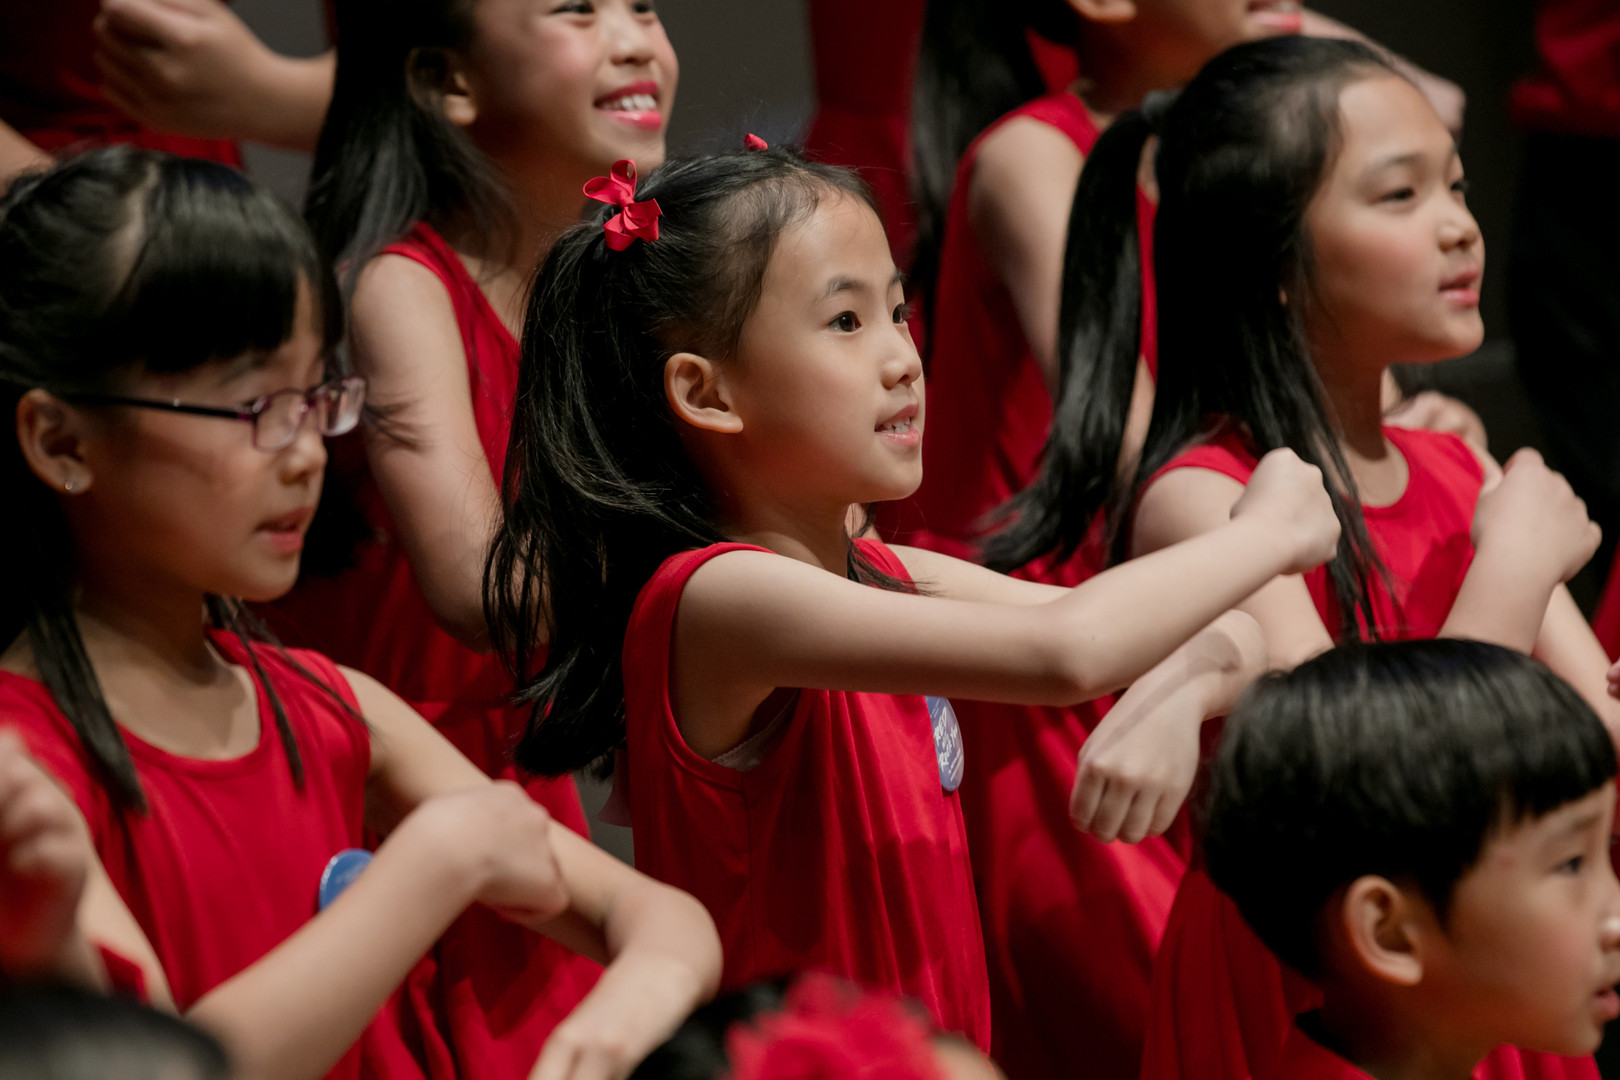 0219_AB_29 april_the show choir_johnnypr